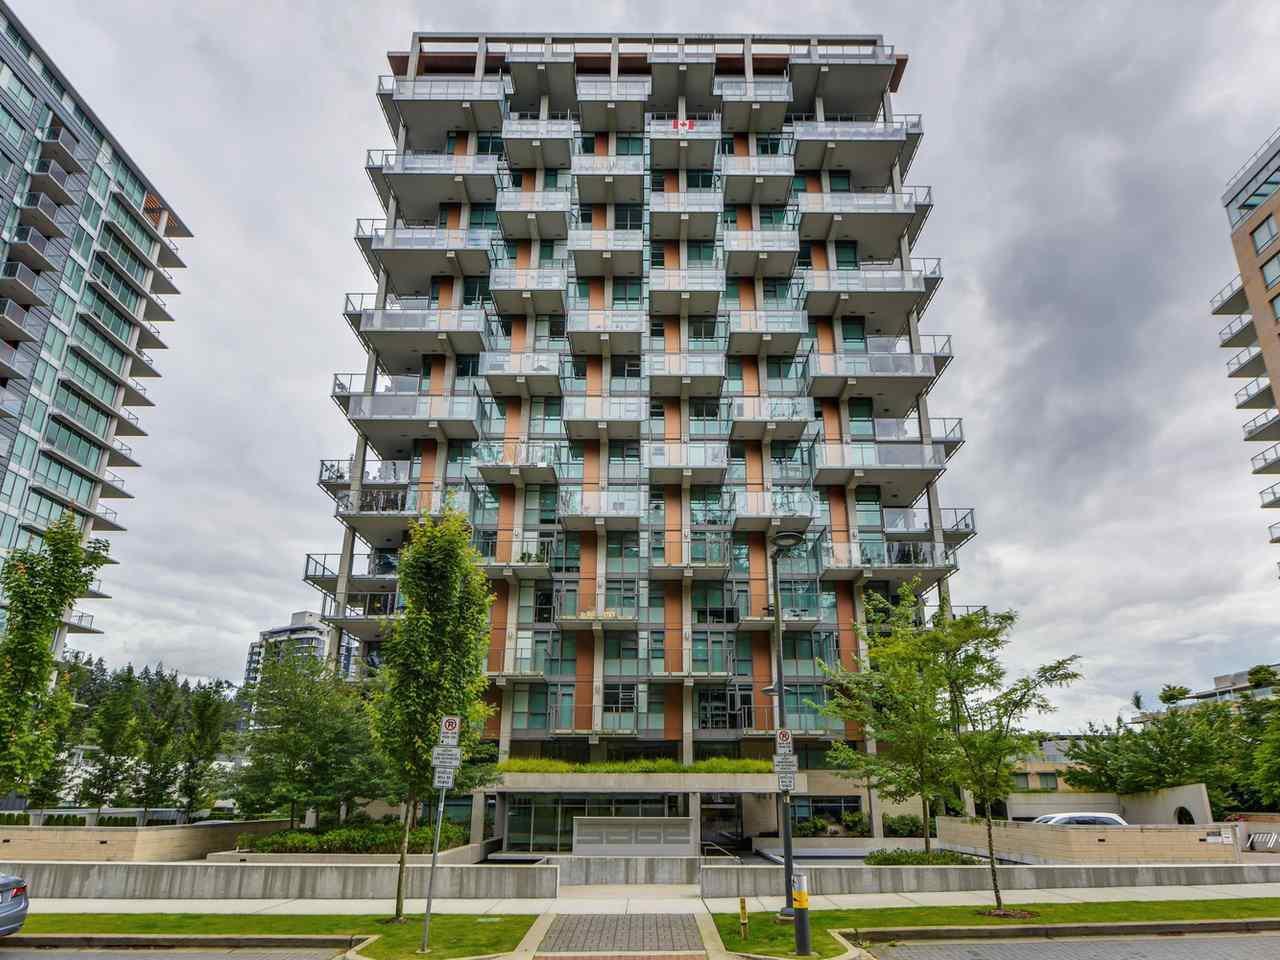 "Main Photo: 603 5782 BERTON Avenue in Vancouver: University VW Condo for sale in ""SAGE"" (Vancouver West)  : MLS®# R2331988"